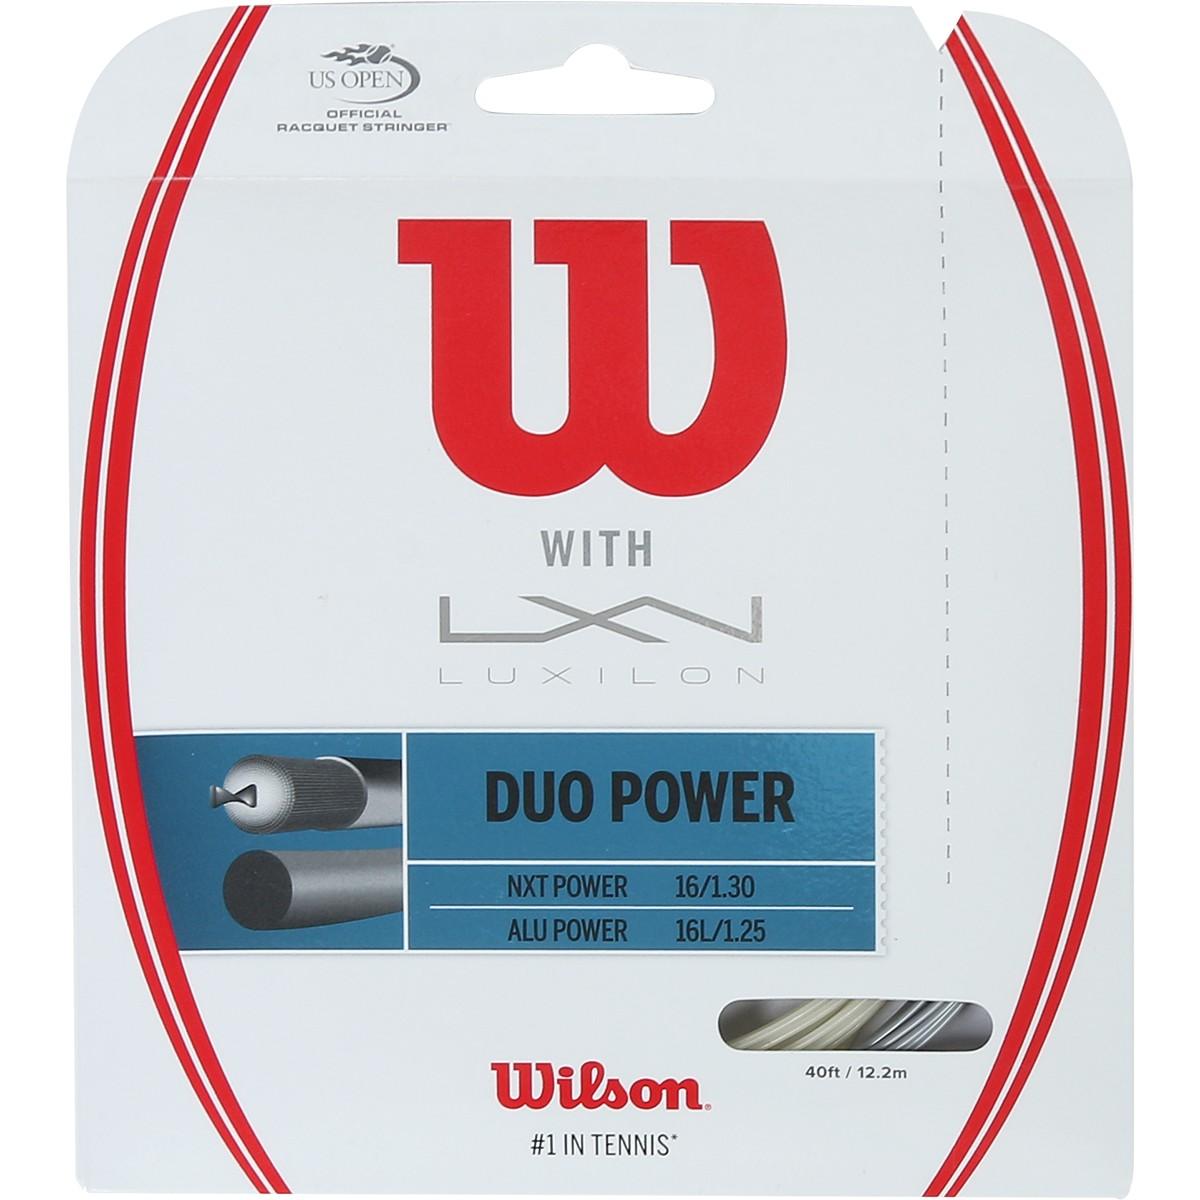 CORDAGE WILSON DUO POWER : LUXILON ALU POWER & WILSON NXT POWER 1.25 (12.20 METRES)